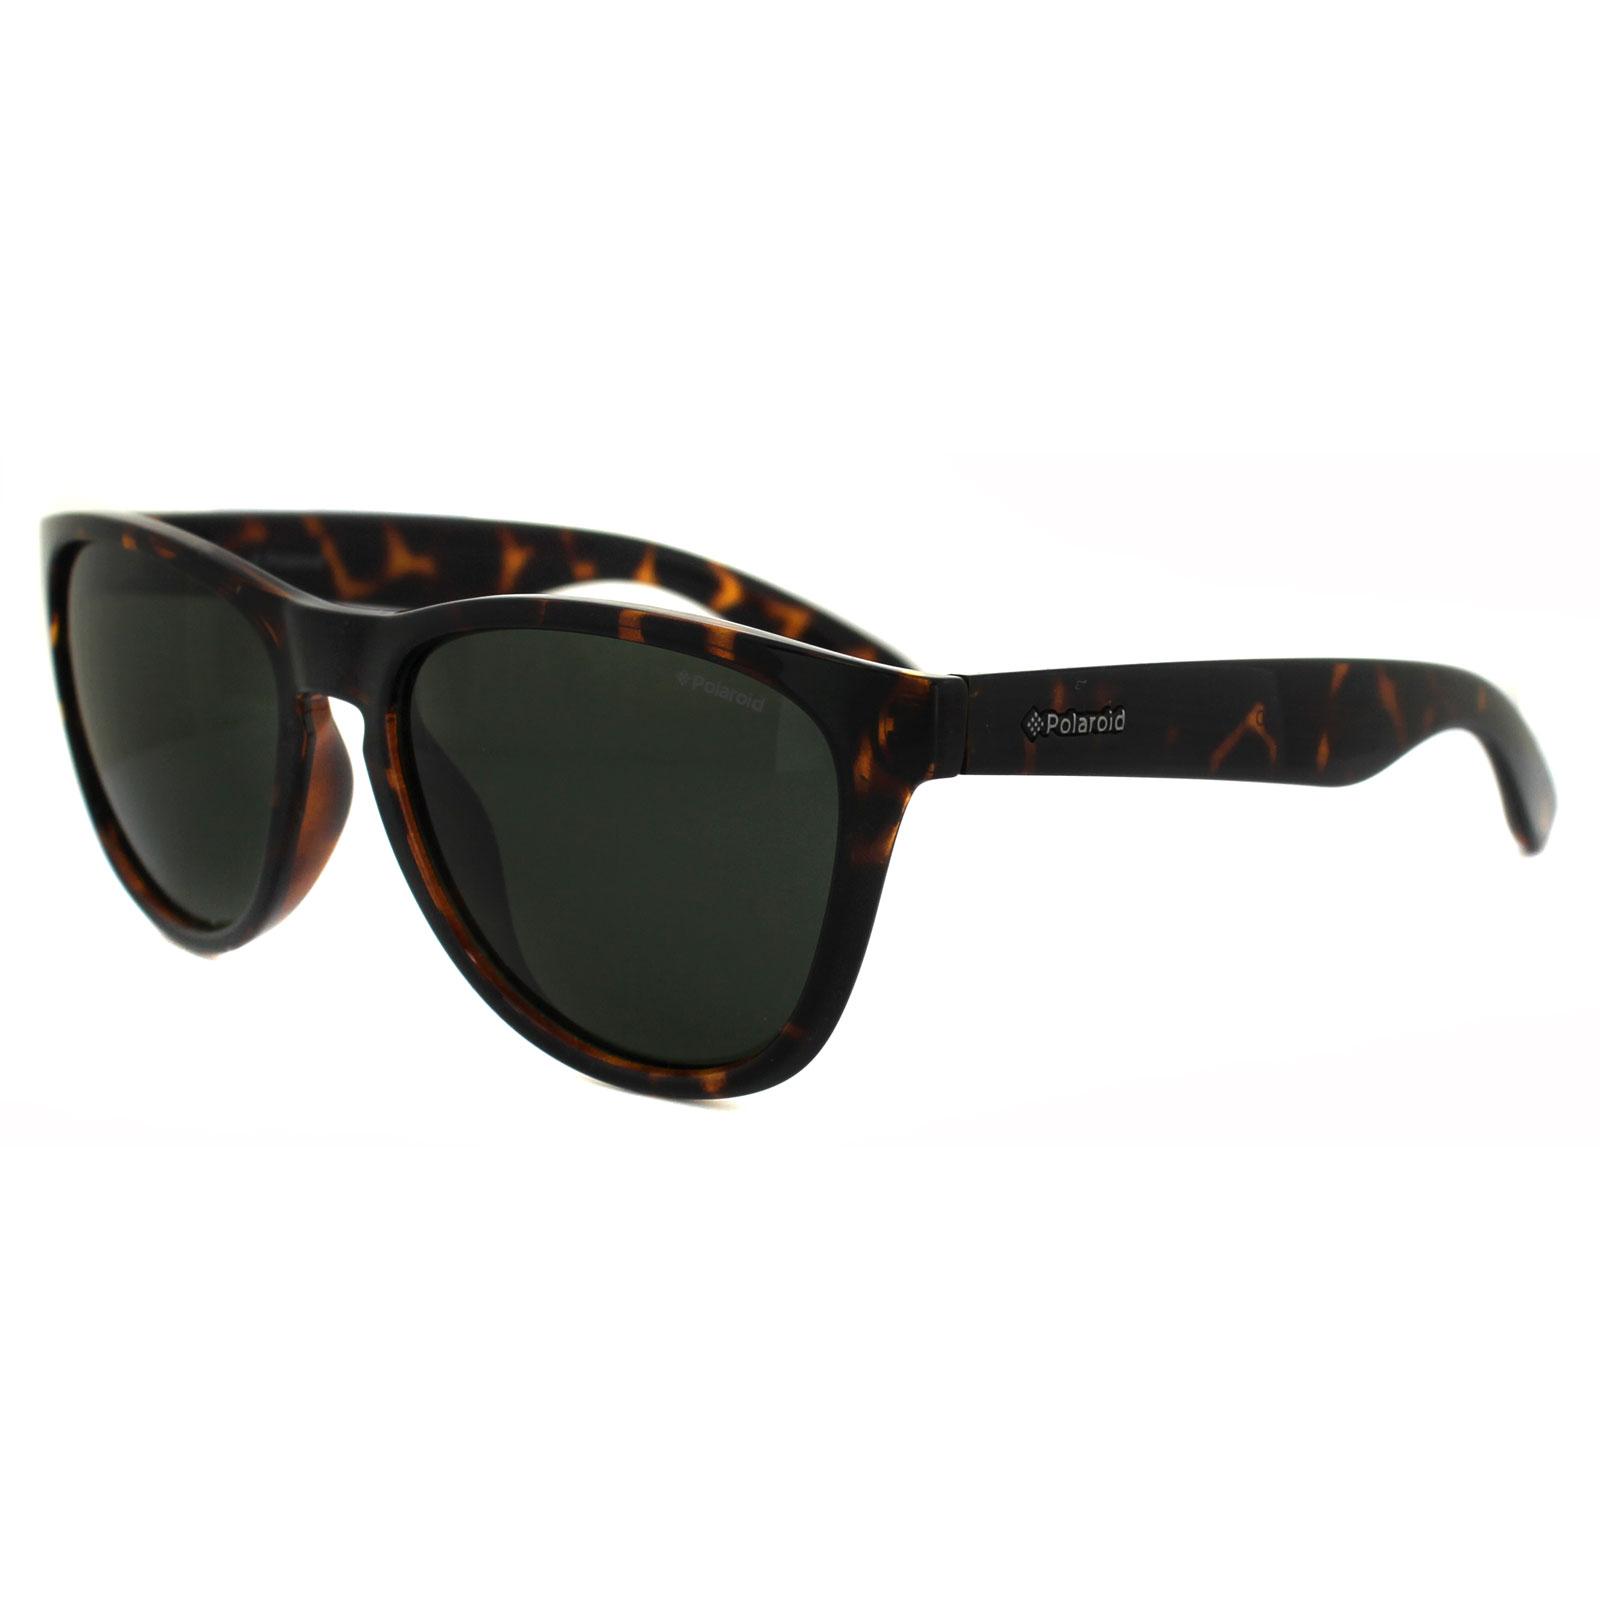 c1d12d3f4ae Sentinel Polaroid Plus Sunglasses PLD 1007 S V08 H8 Havana Green Polarized